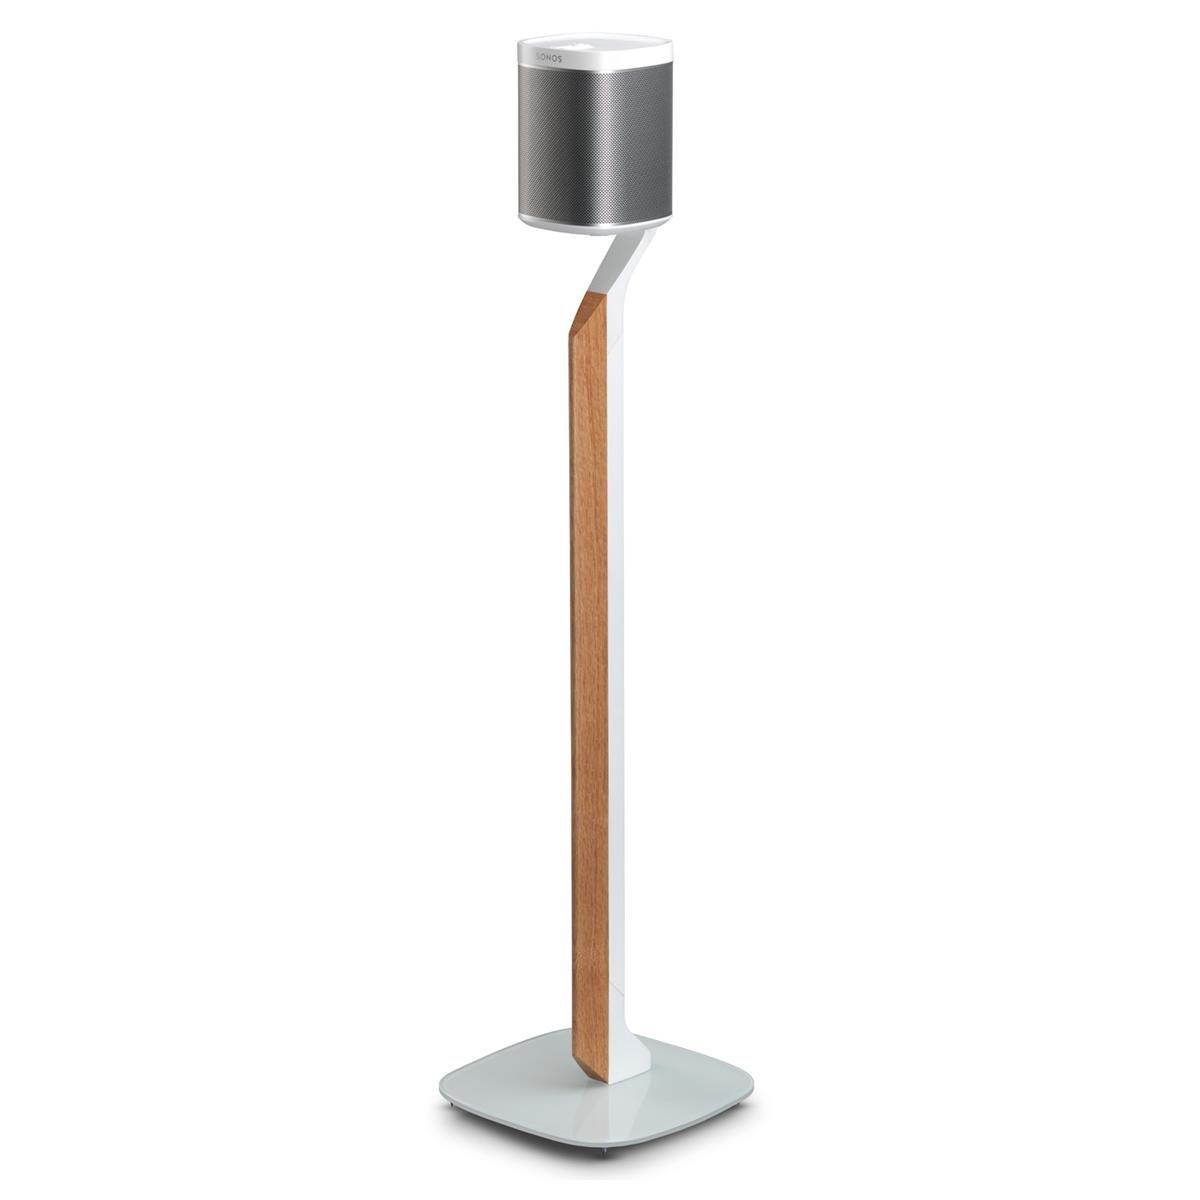 Flexson Premium Floor Stand for Sonos PLAY:1 (White)